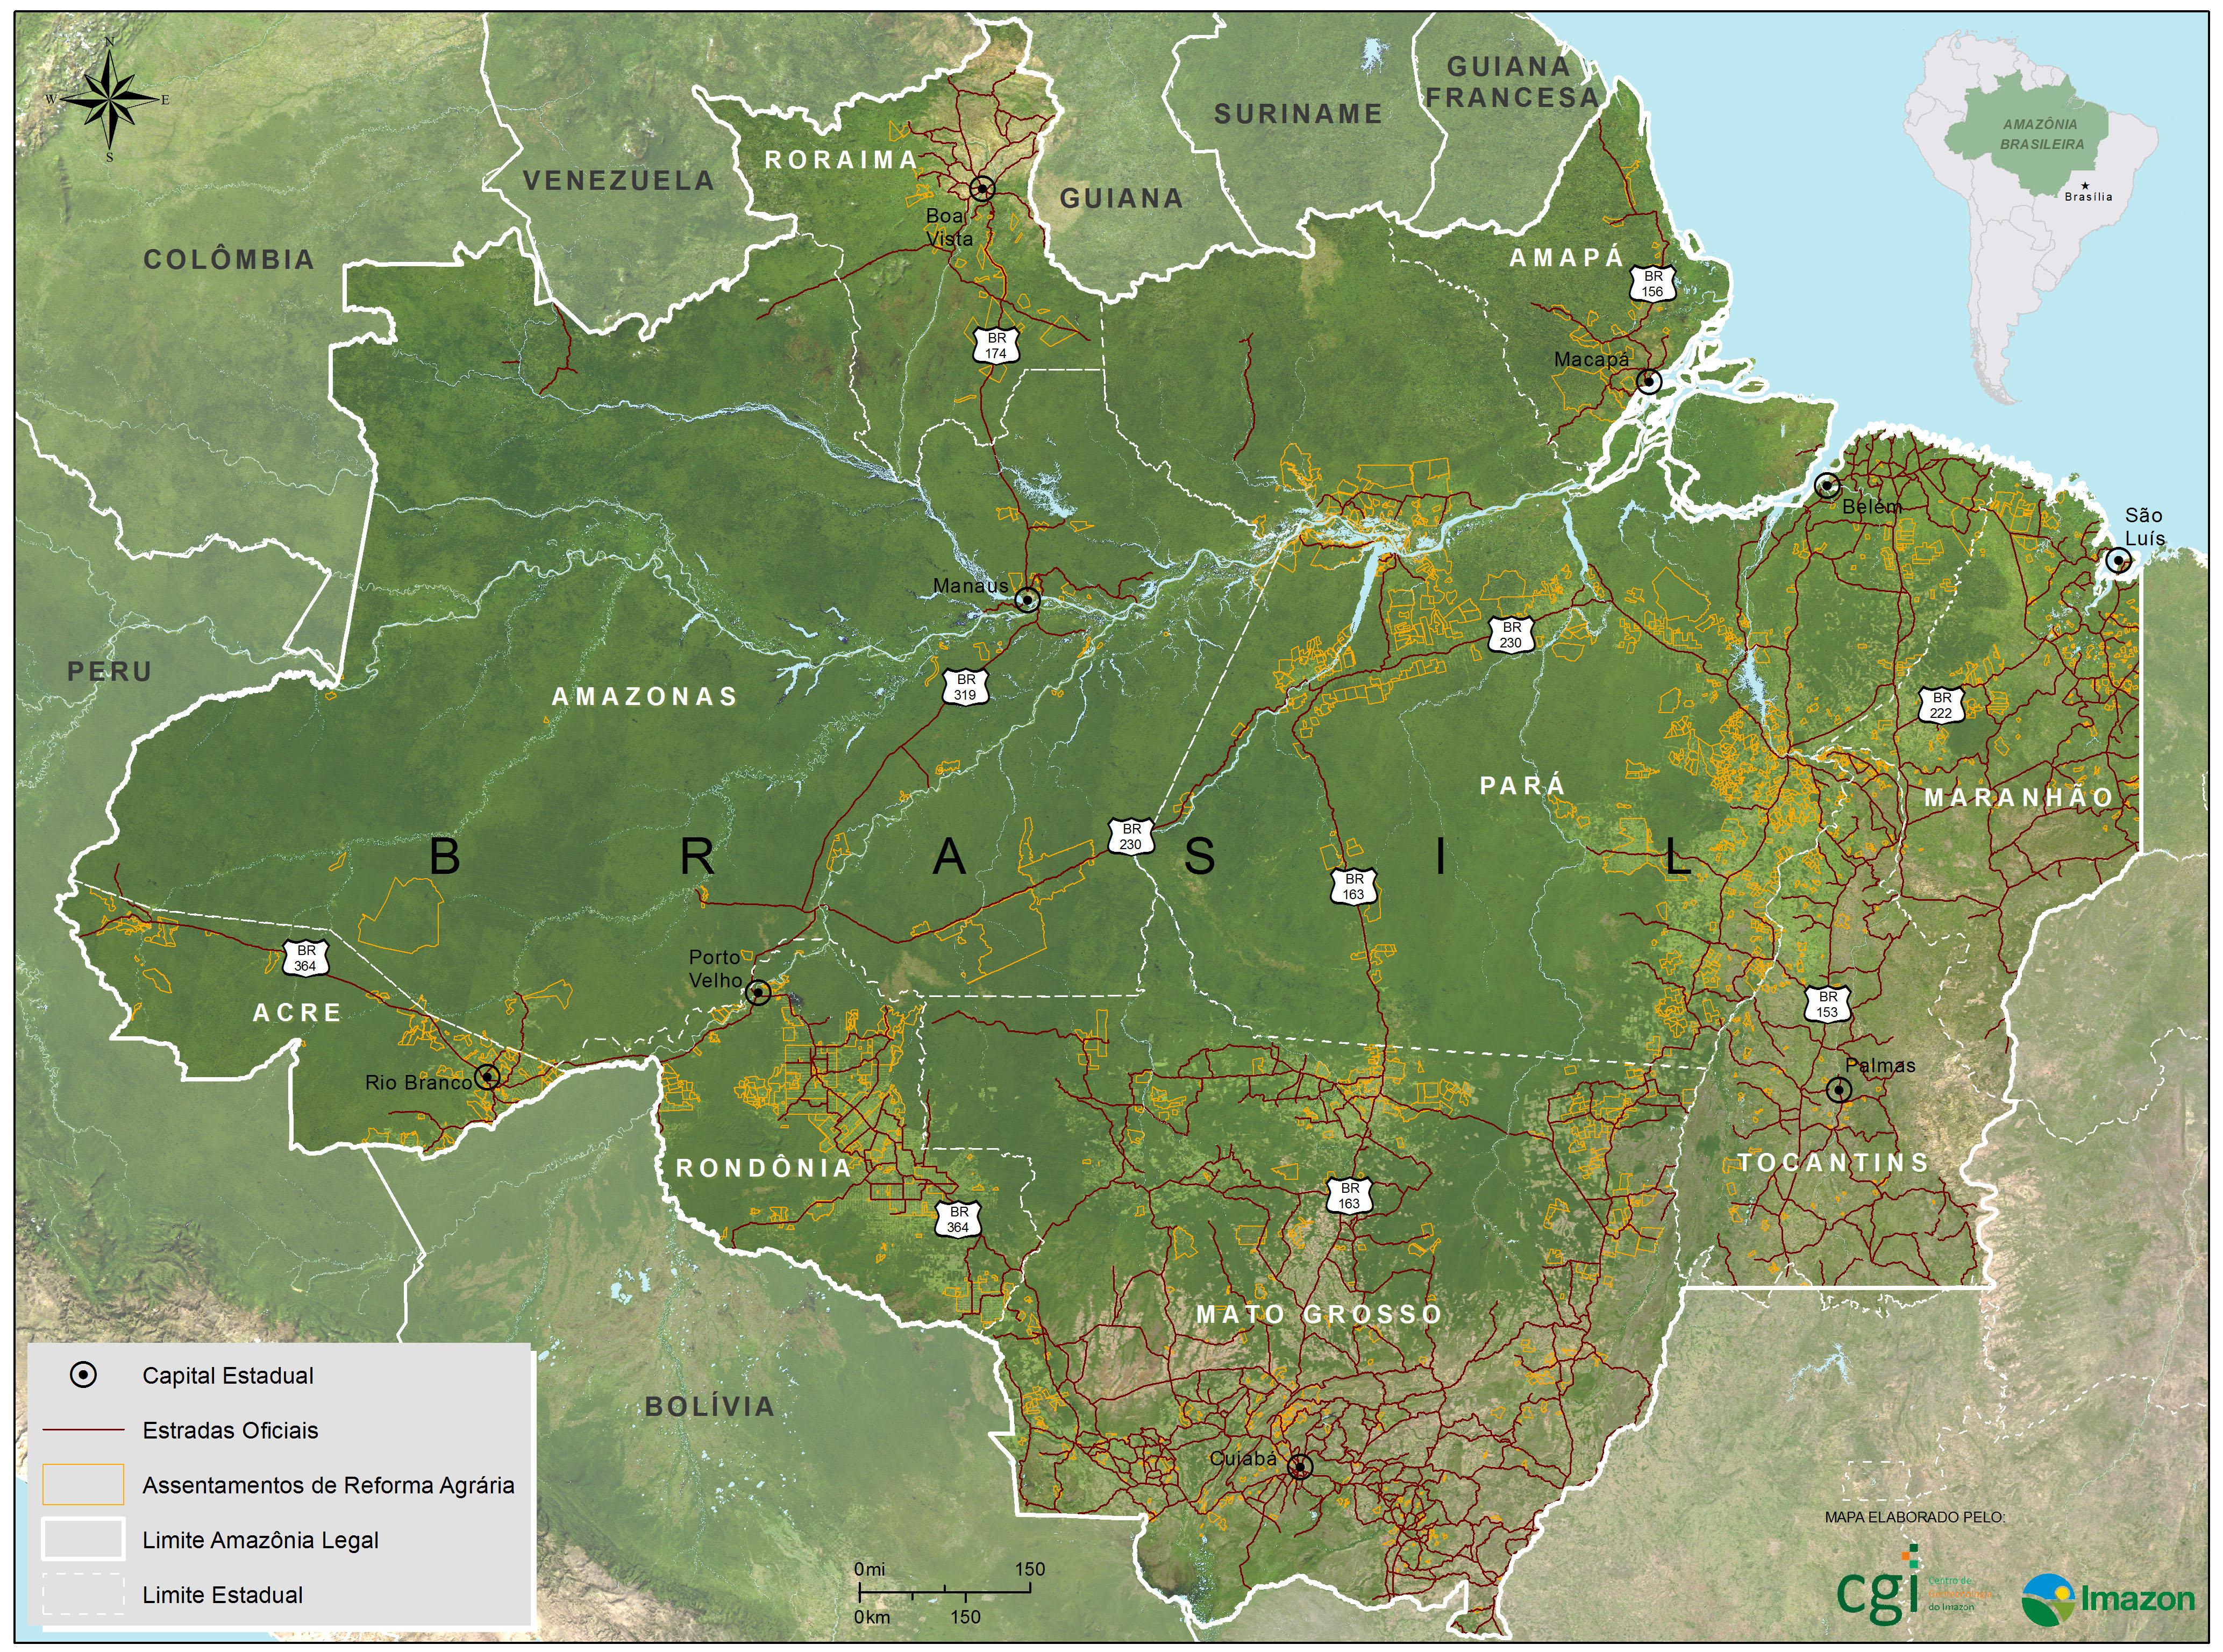 20-os-estados-brasileiros-que-compoem-a-amazonia-legal